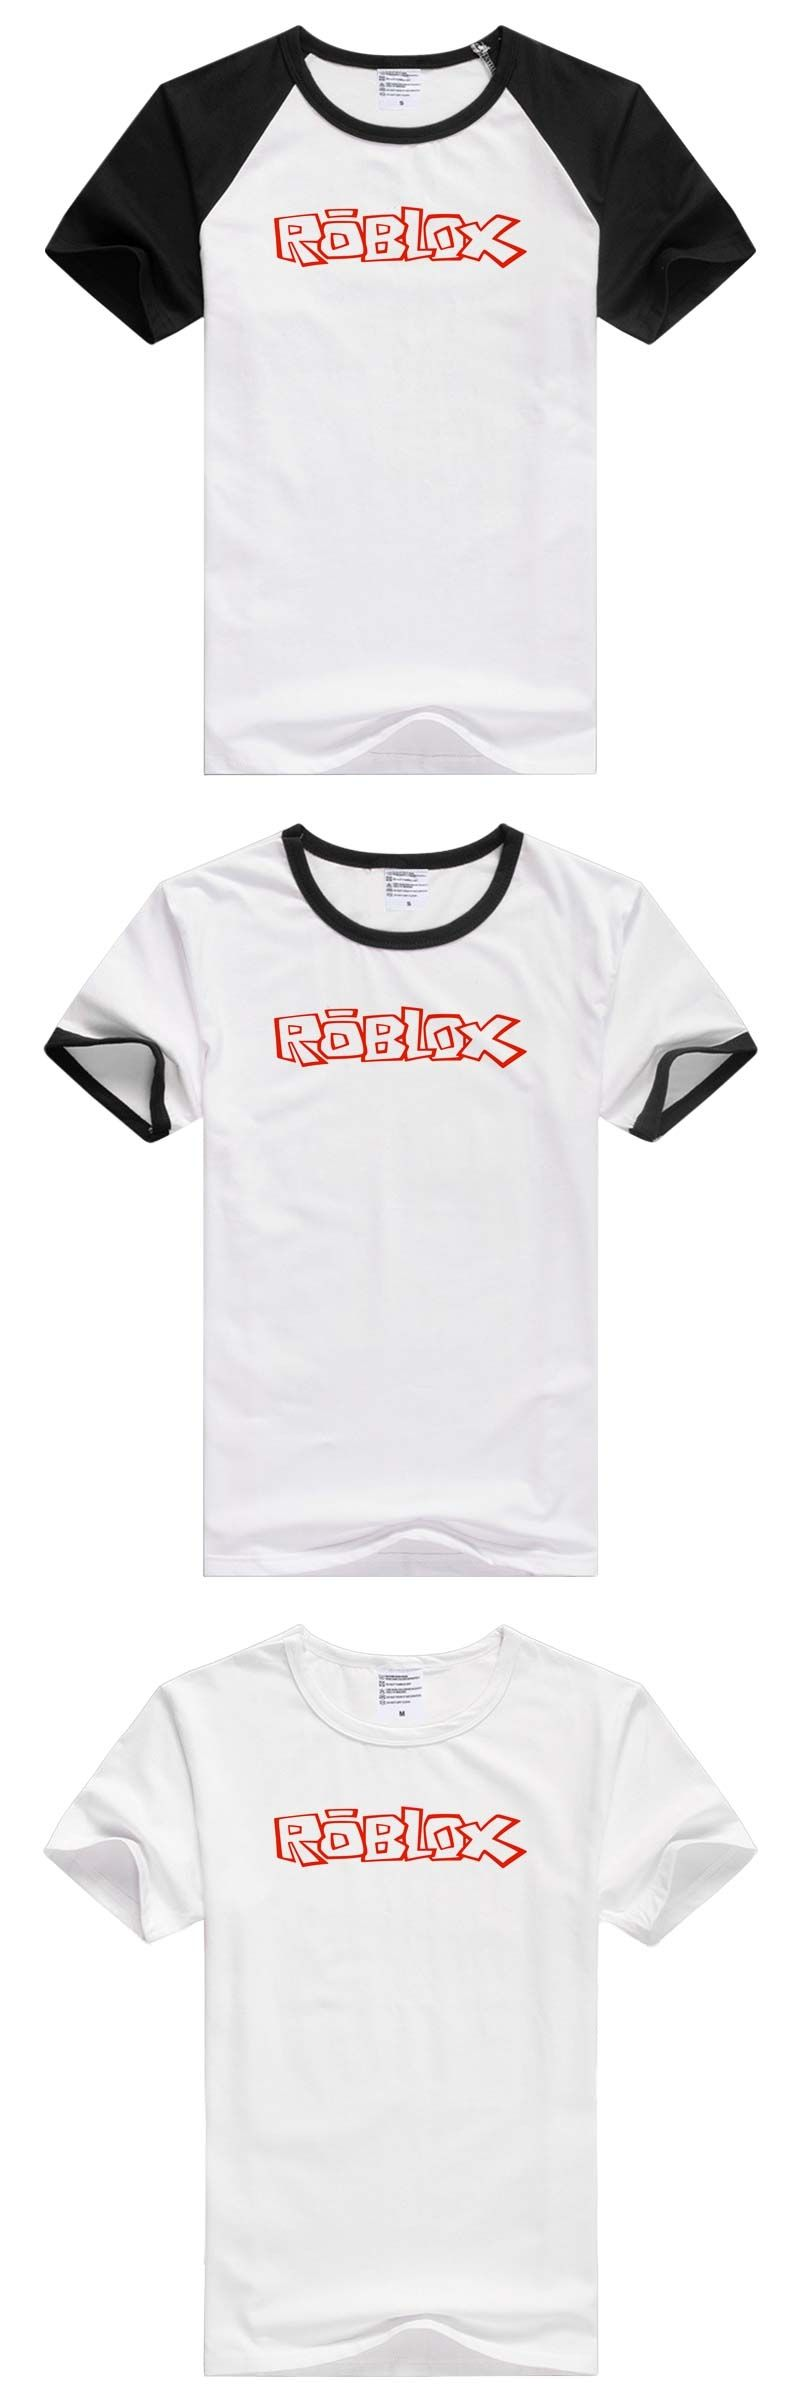 Best T Shirts On Roblox « Alzheimer's Network of Oregon